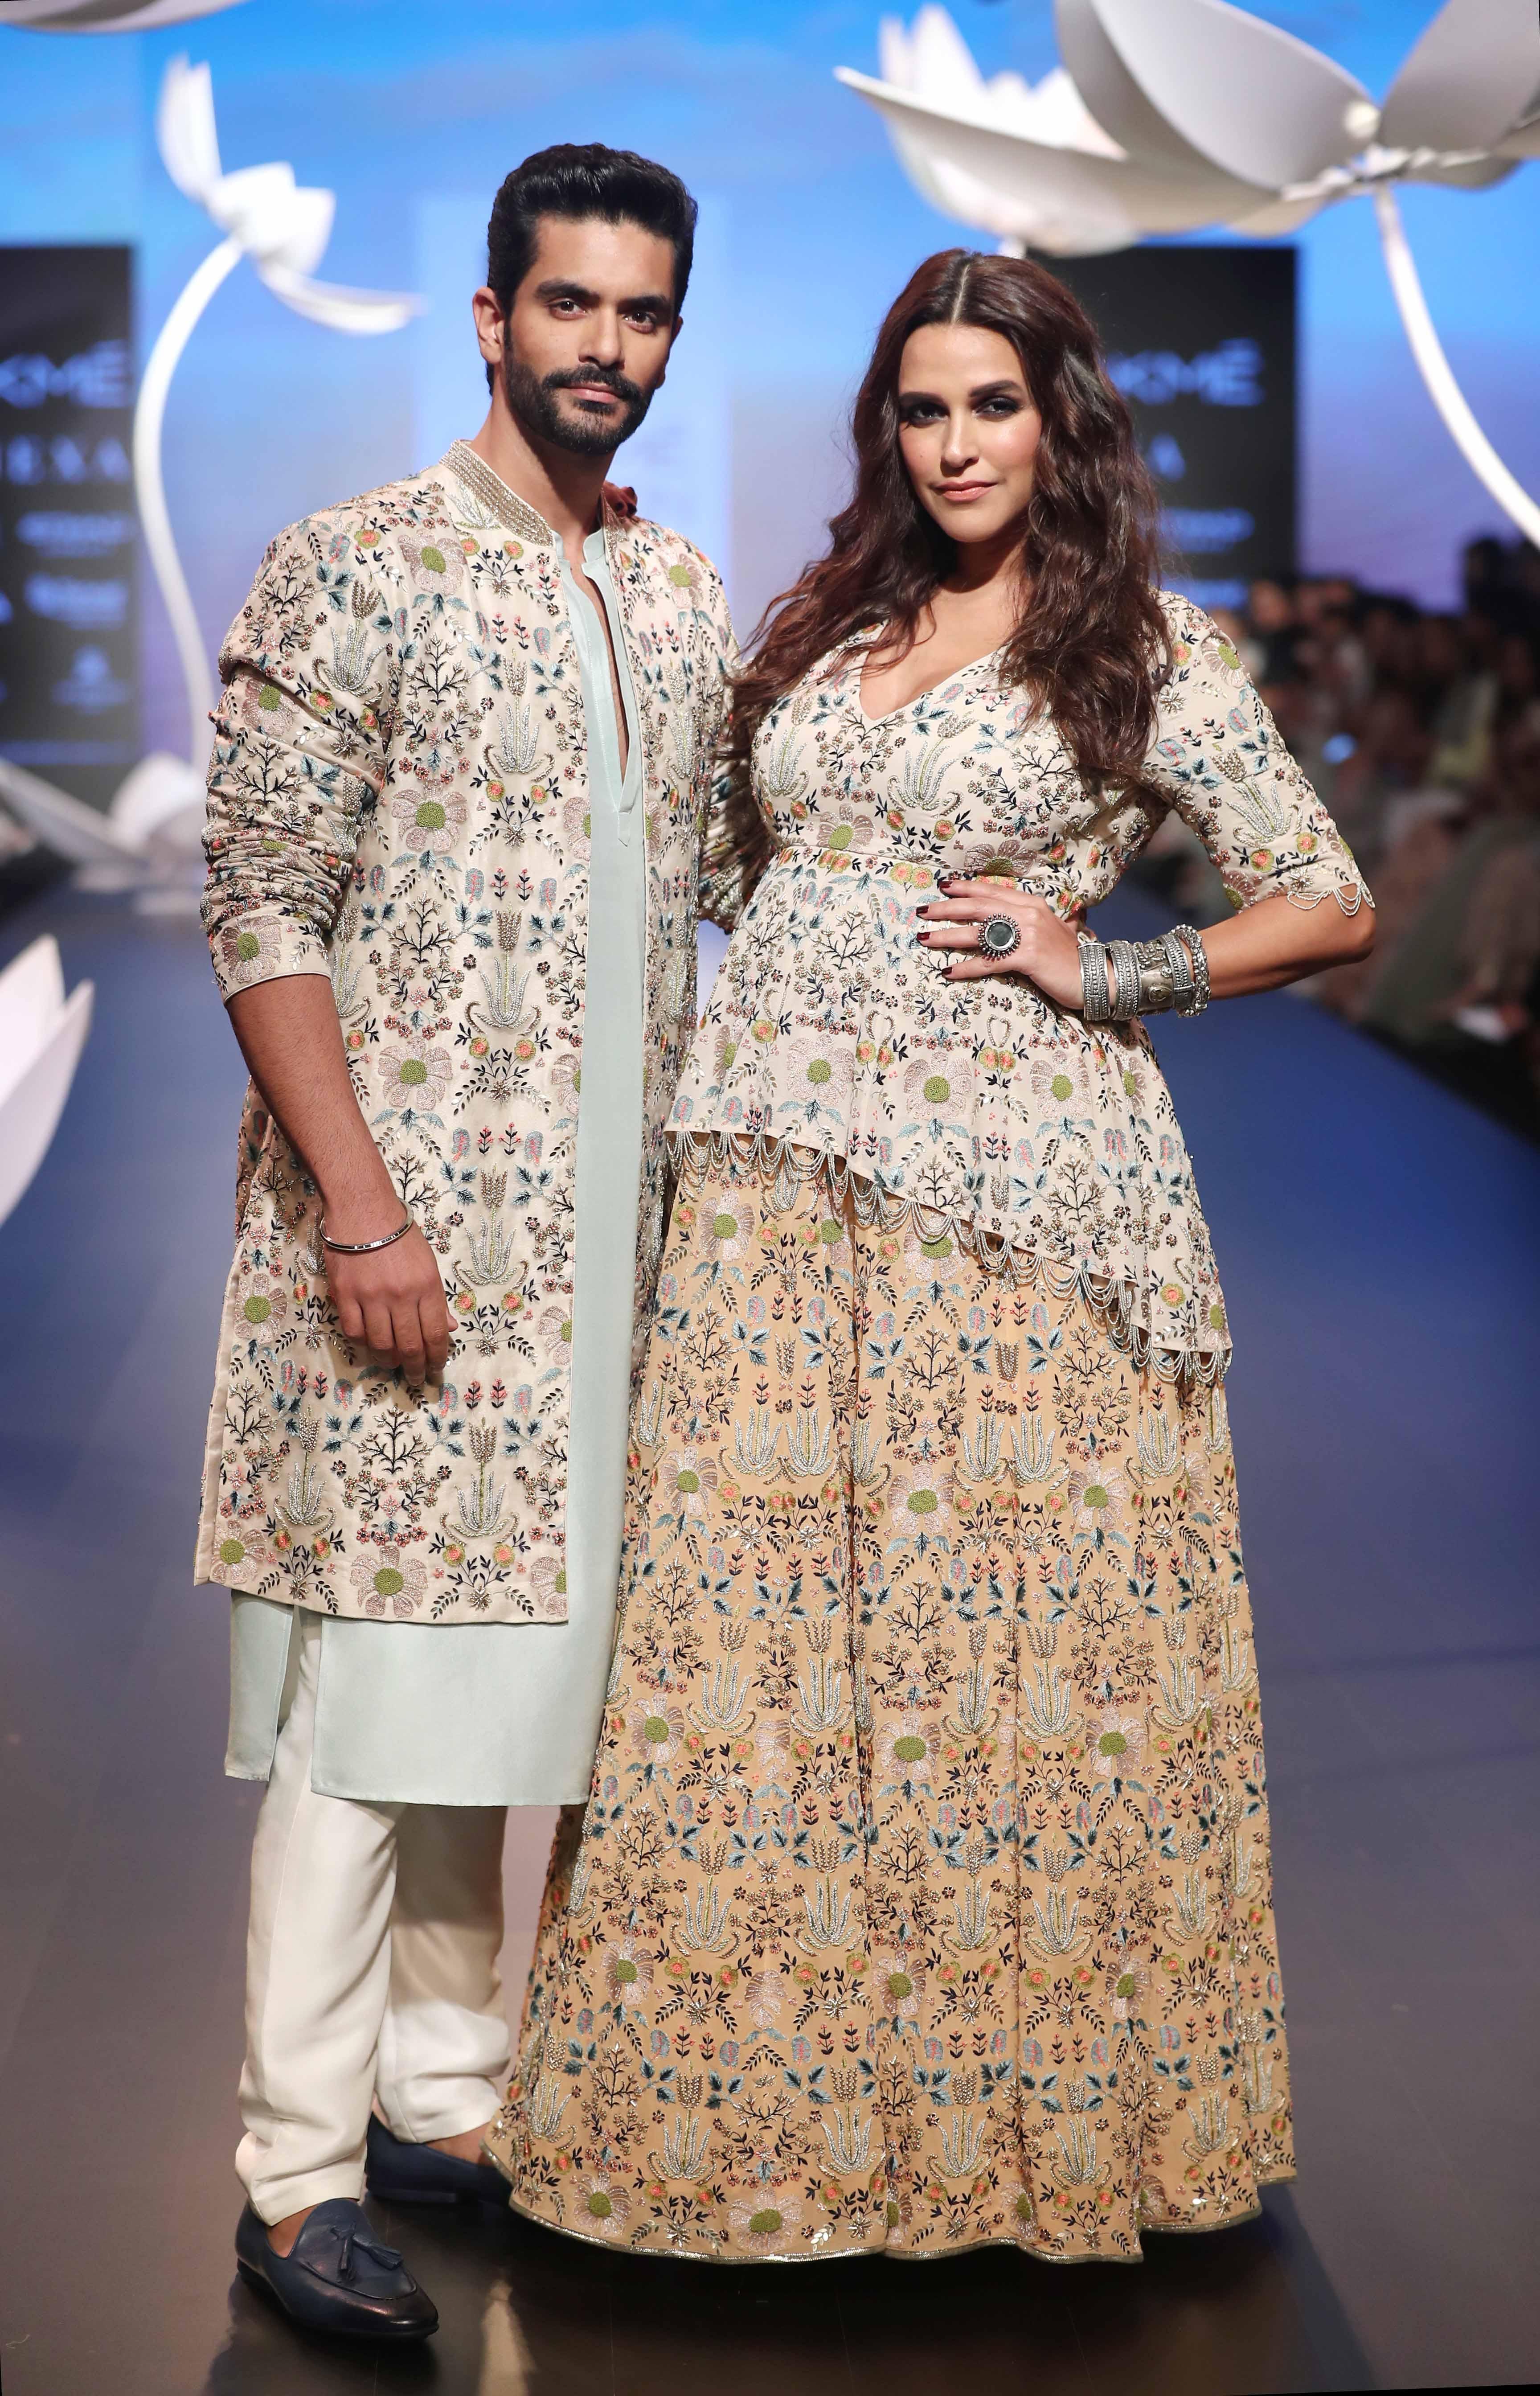 Angal Bedi and Neha Dhupia for Payal Singhal and Lakme Salon at Lakme Fashion Week WF 2018